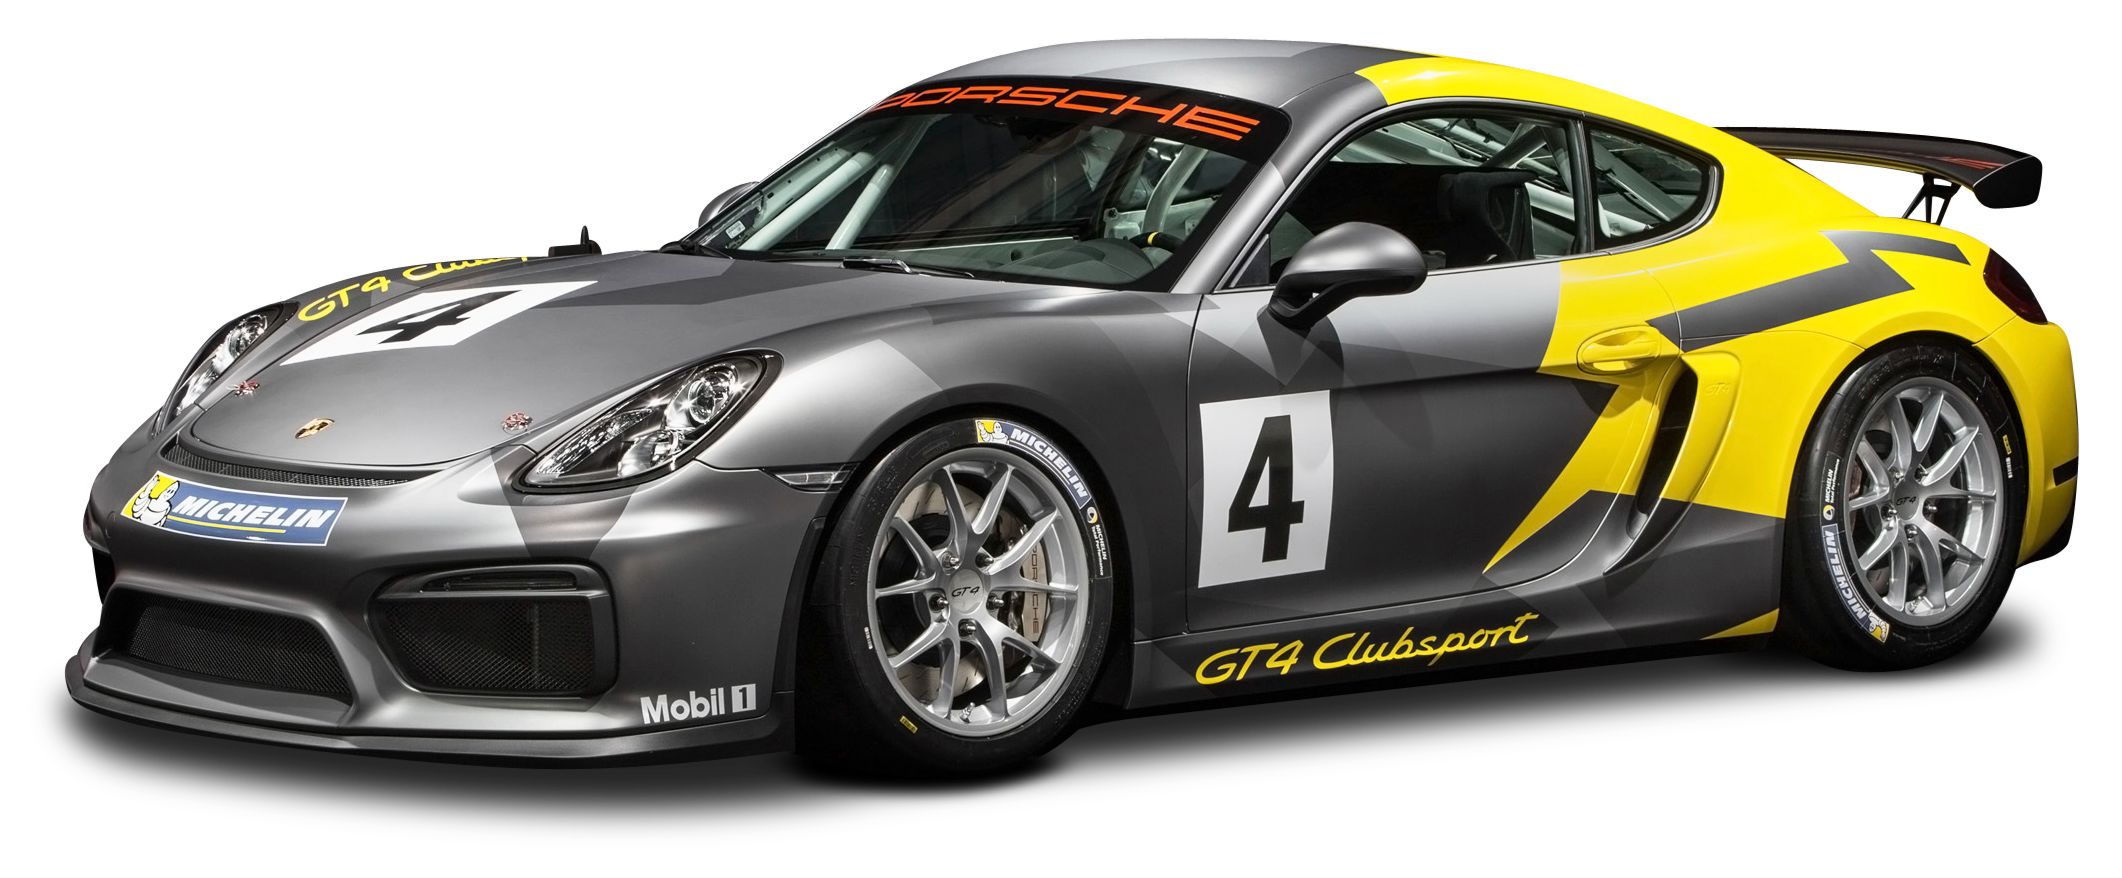 PNGPIX-COM-Porsche-Cayman-GT4-Clubsport-Racing-Car-PNG-Image.png (2122×878)    Coches   Pinterest - Porsche HD PNG